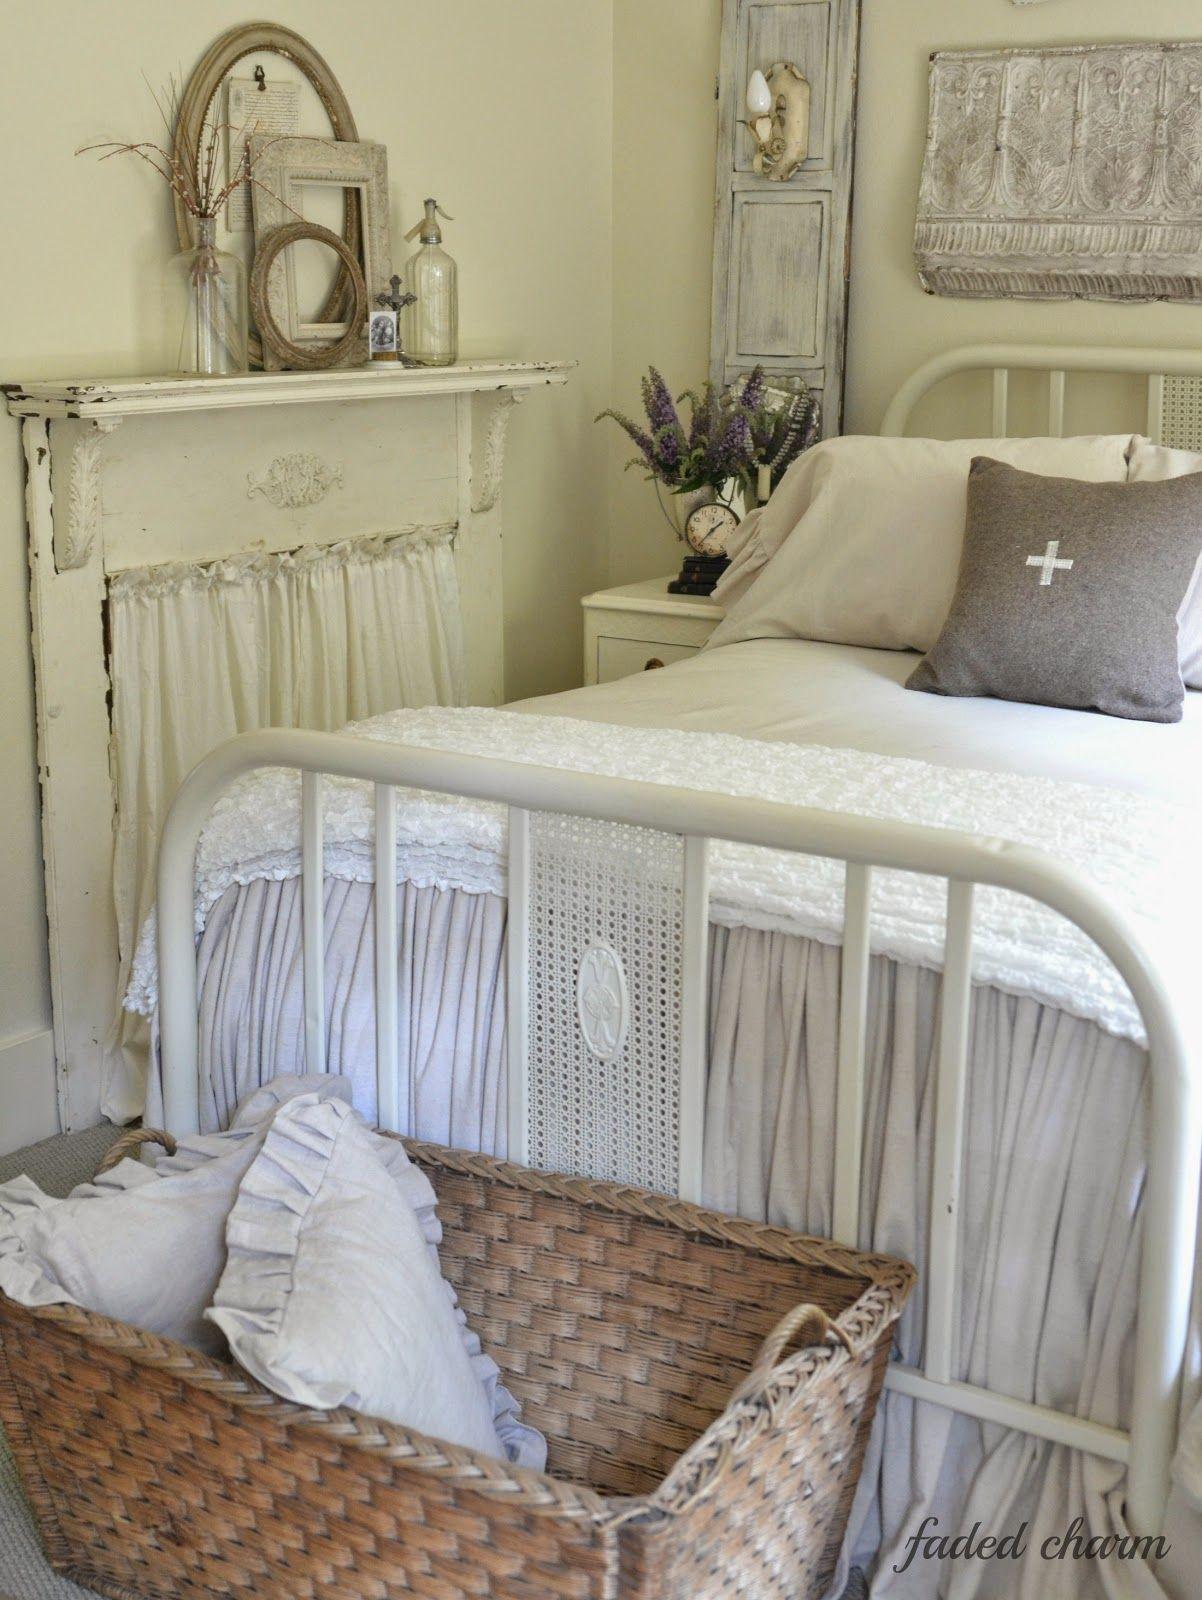 By the bed bedroom vintage bedroom decor bedroom